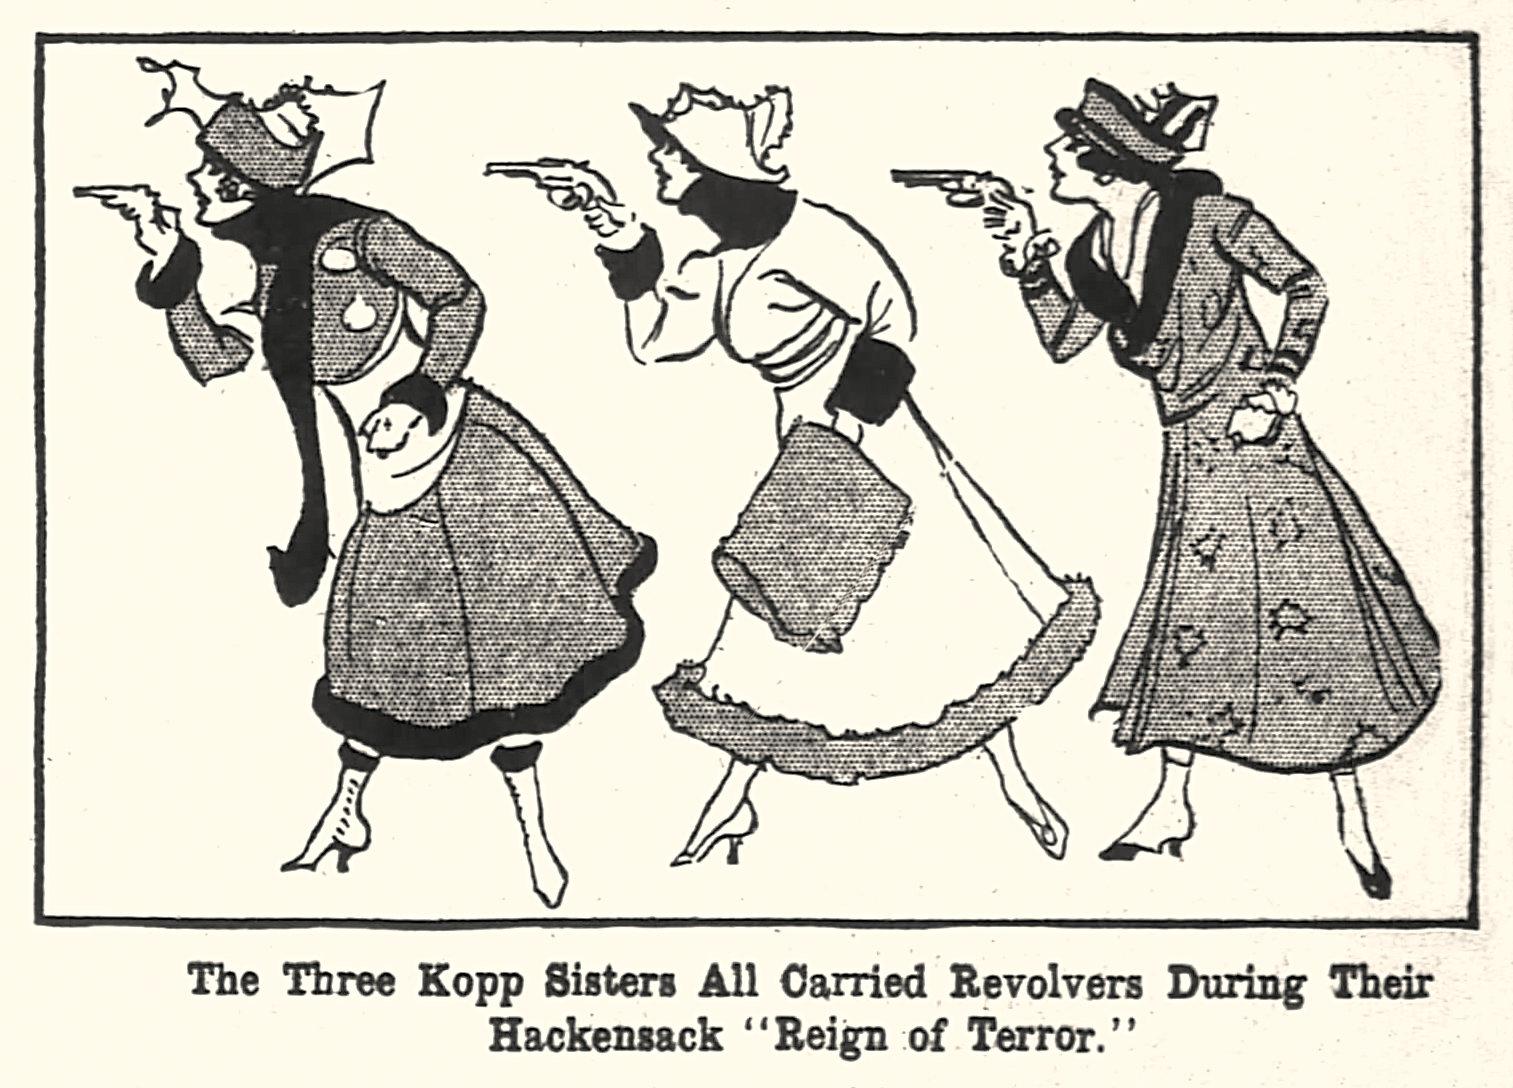 https://i2.wp.com/www.amystewart.com/wp-content/uploads/2015/04/Kopp-sisters-revolvers.jpg